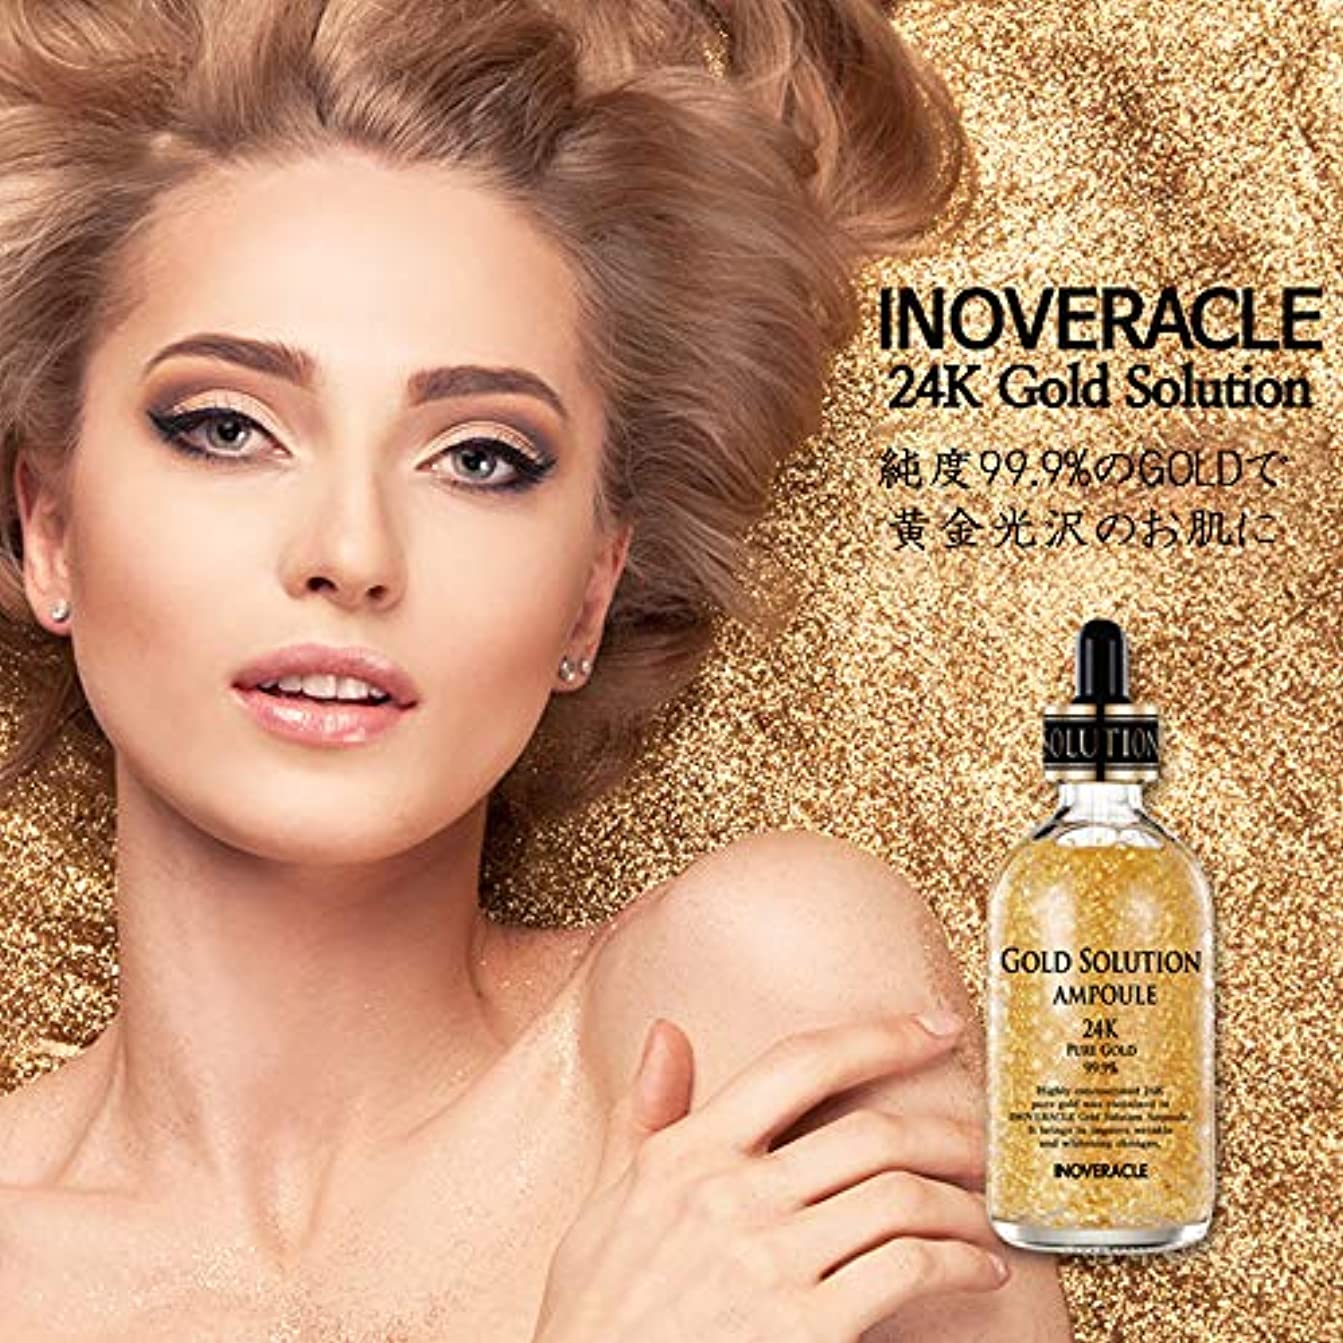 INOVERACLE GOLD SOLUTION AMPOULE 24K 99.9% 純金 アンプル 100ml 美容液 スキンケア 韓国化粧品 光沢お肌 美白美容液